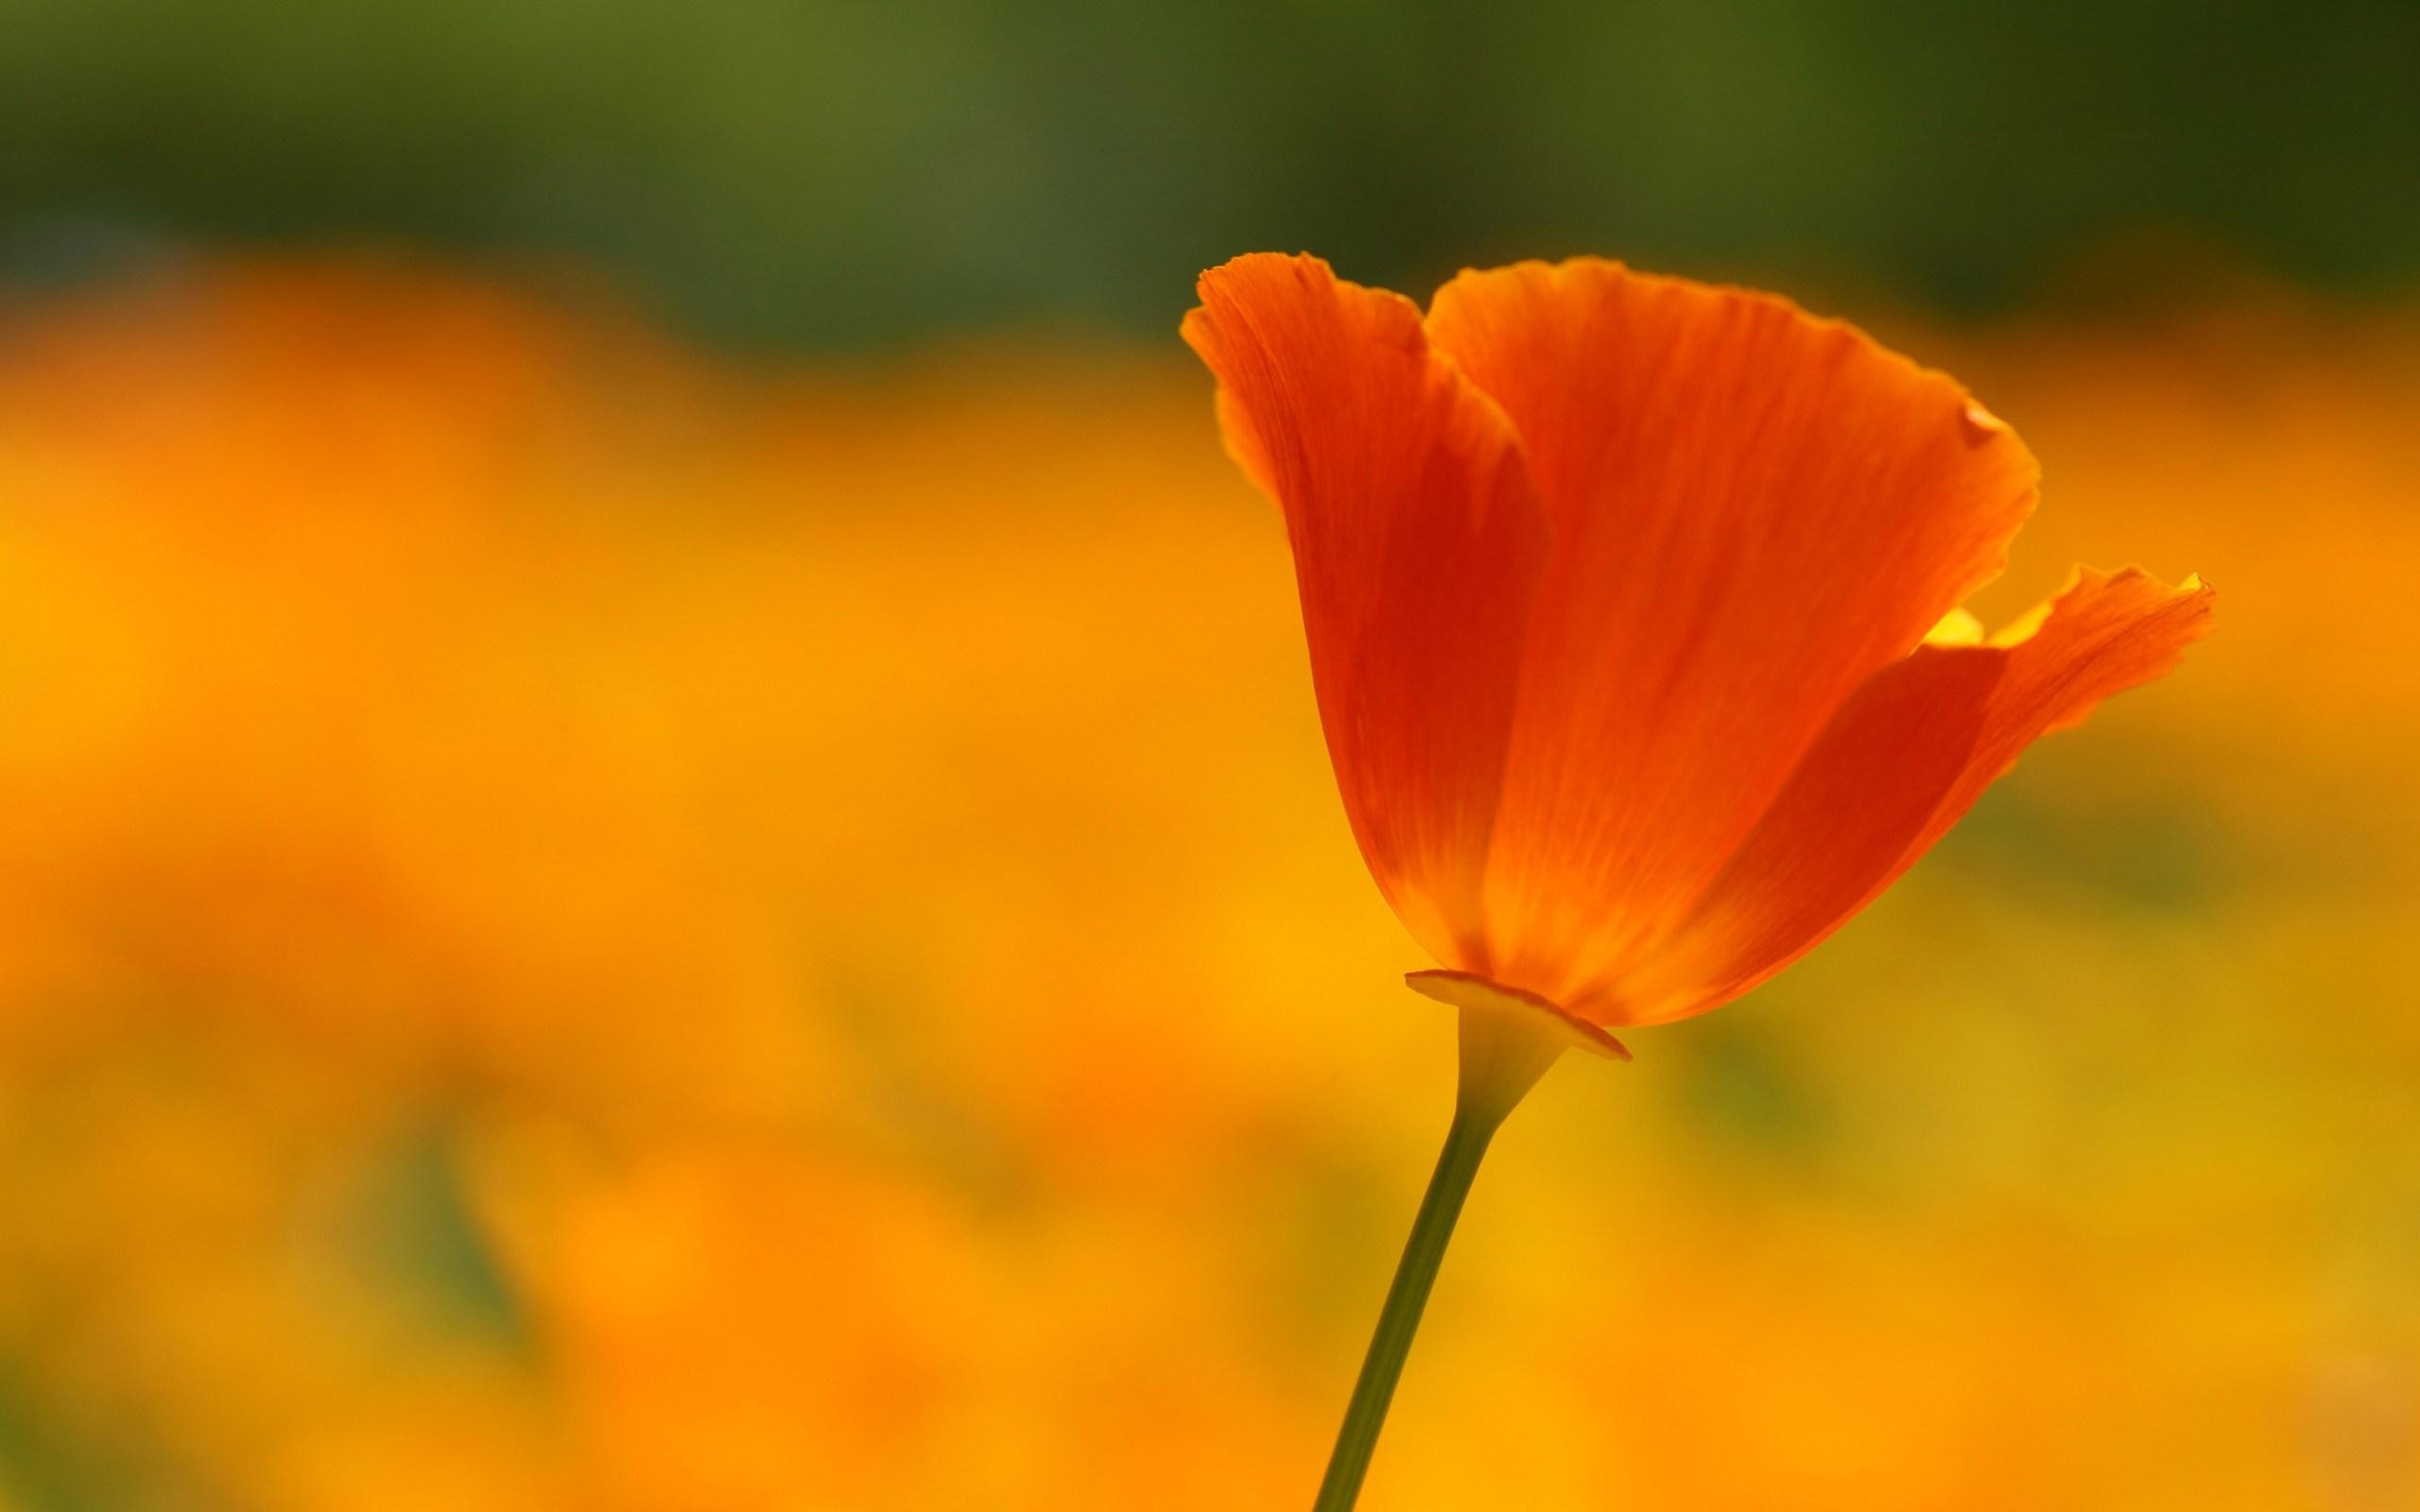 Poppy Flower Summer Close-Up